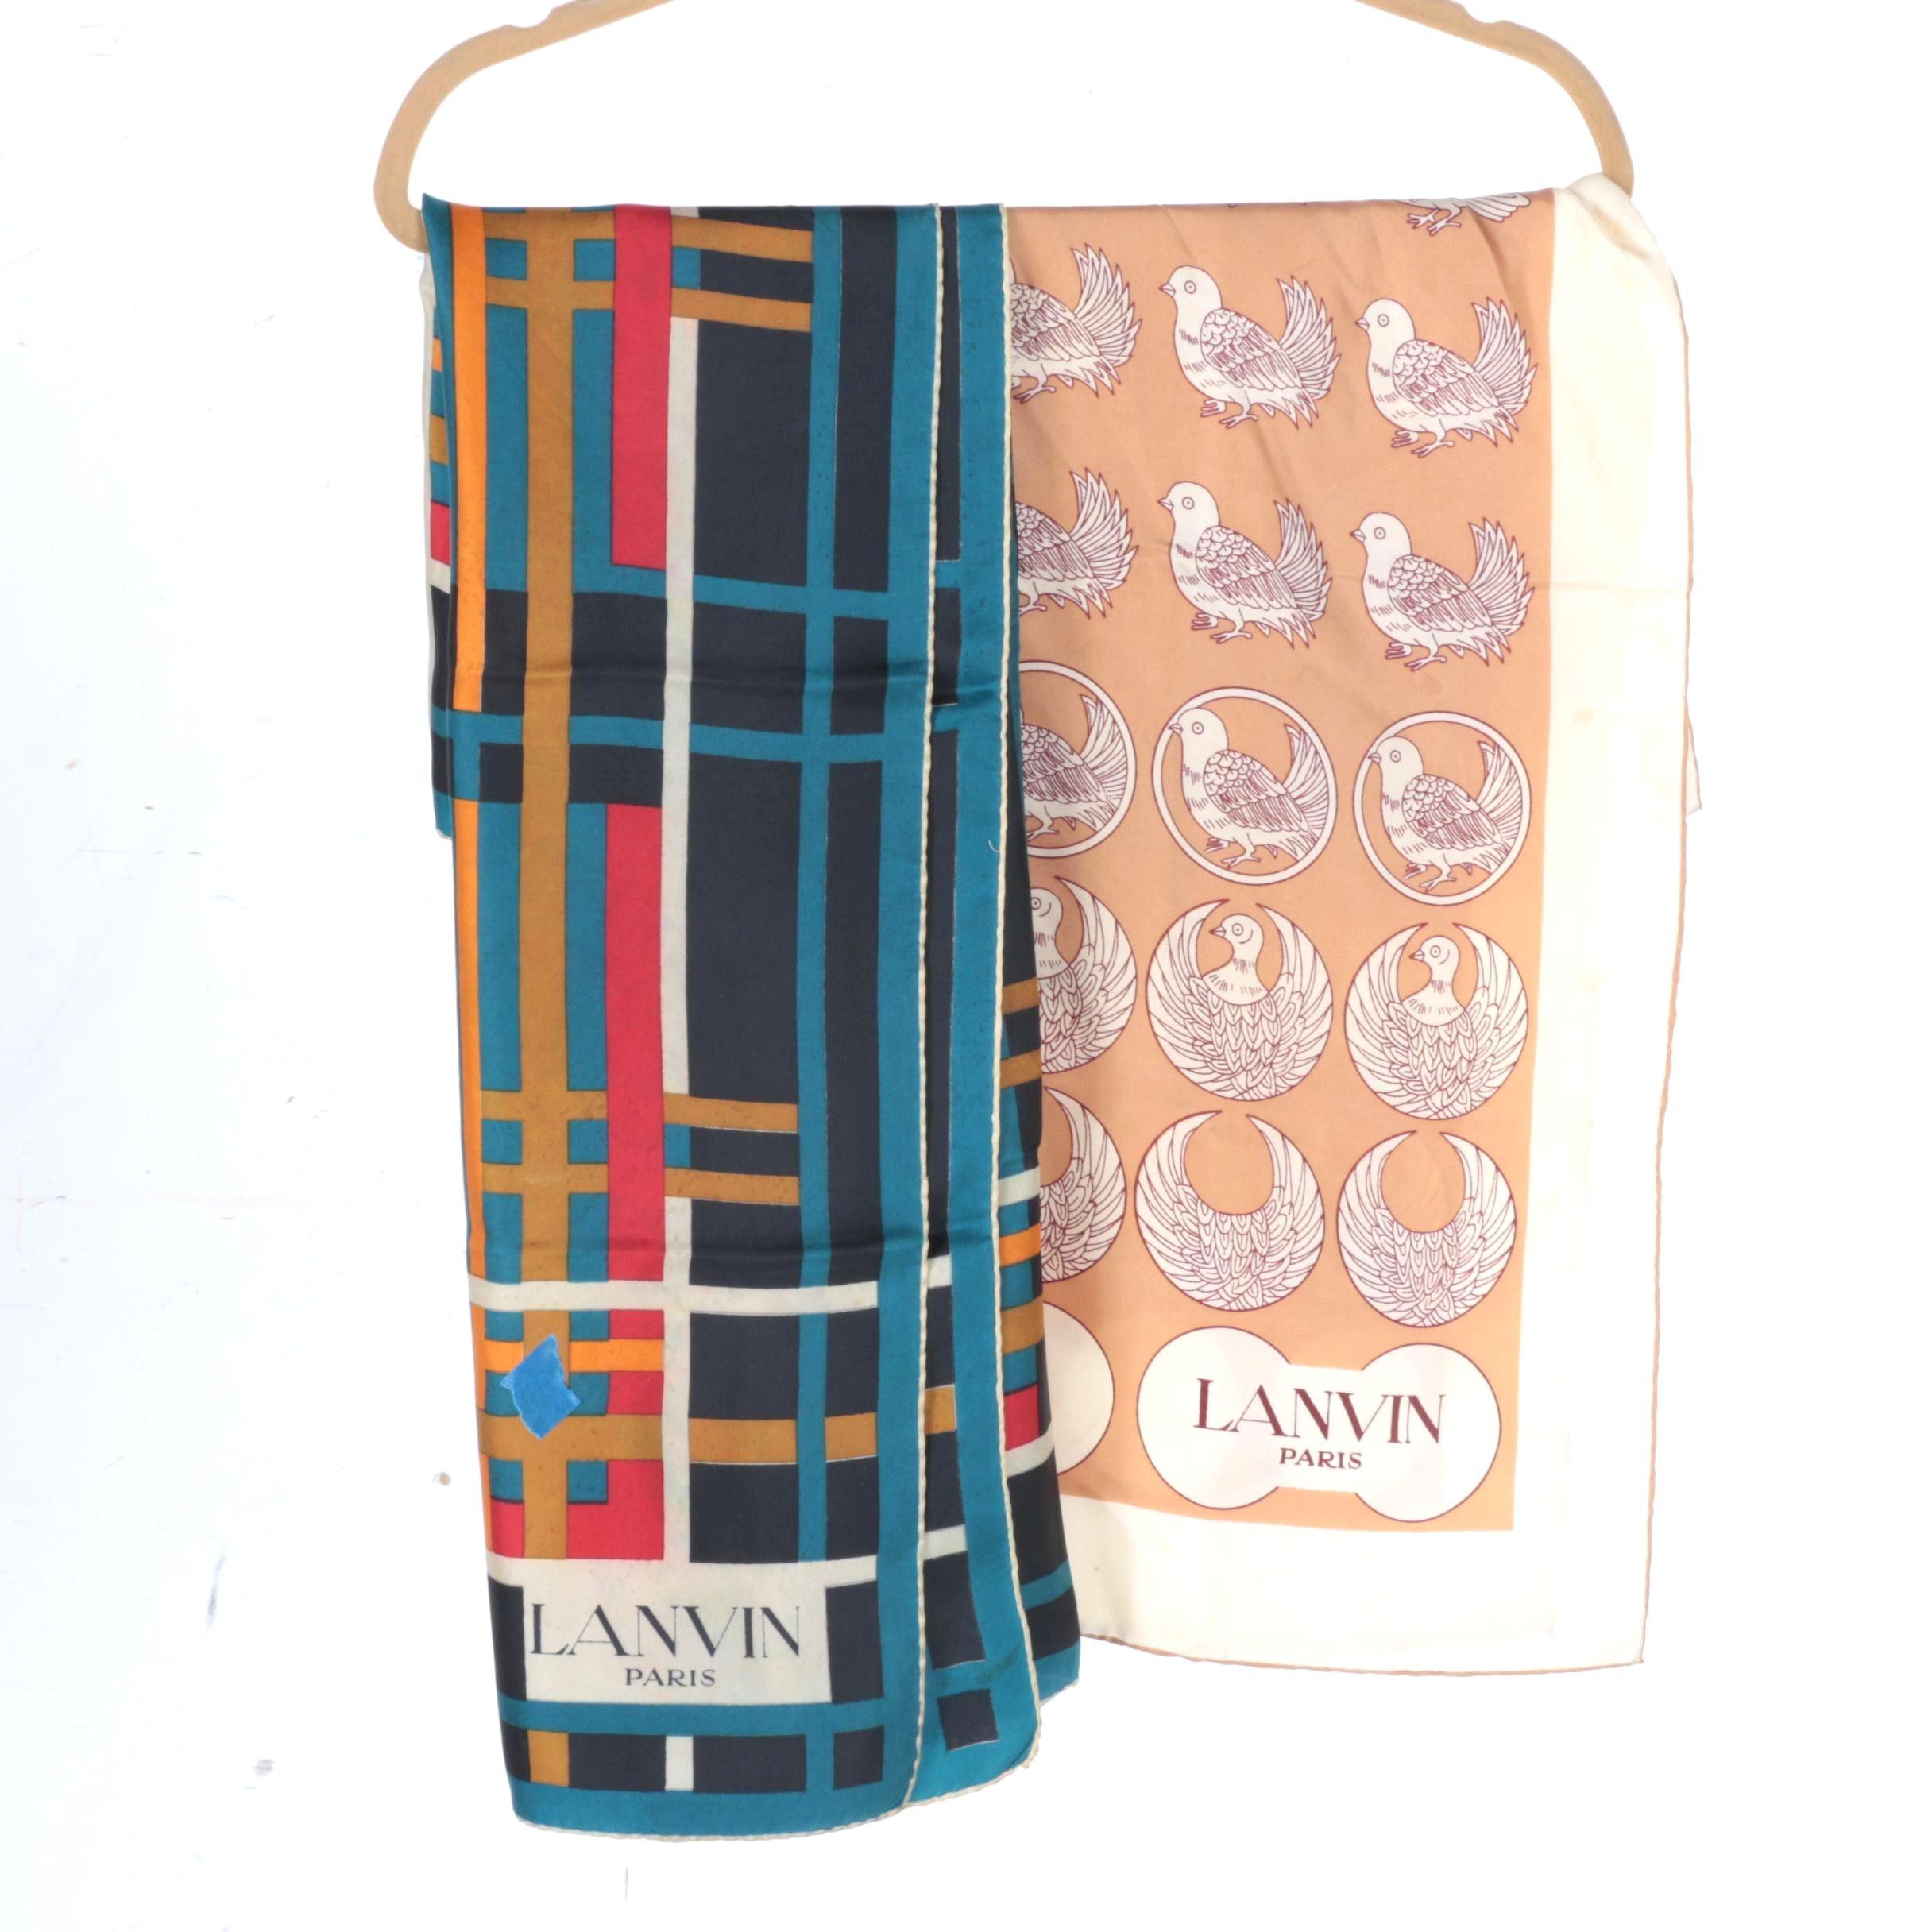 Silk Scarves By Lanvin Paris